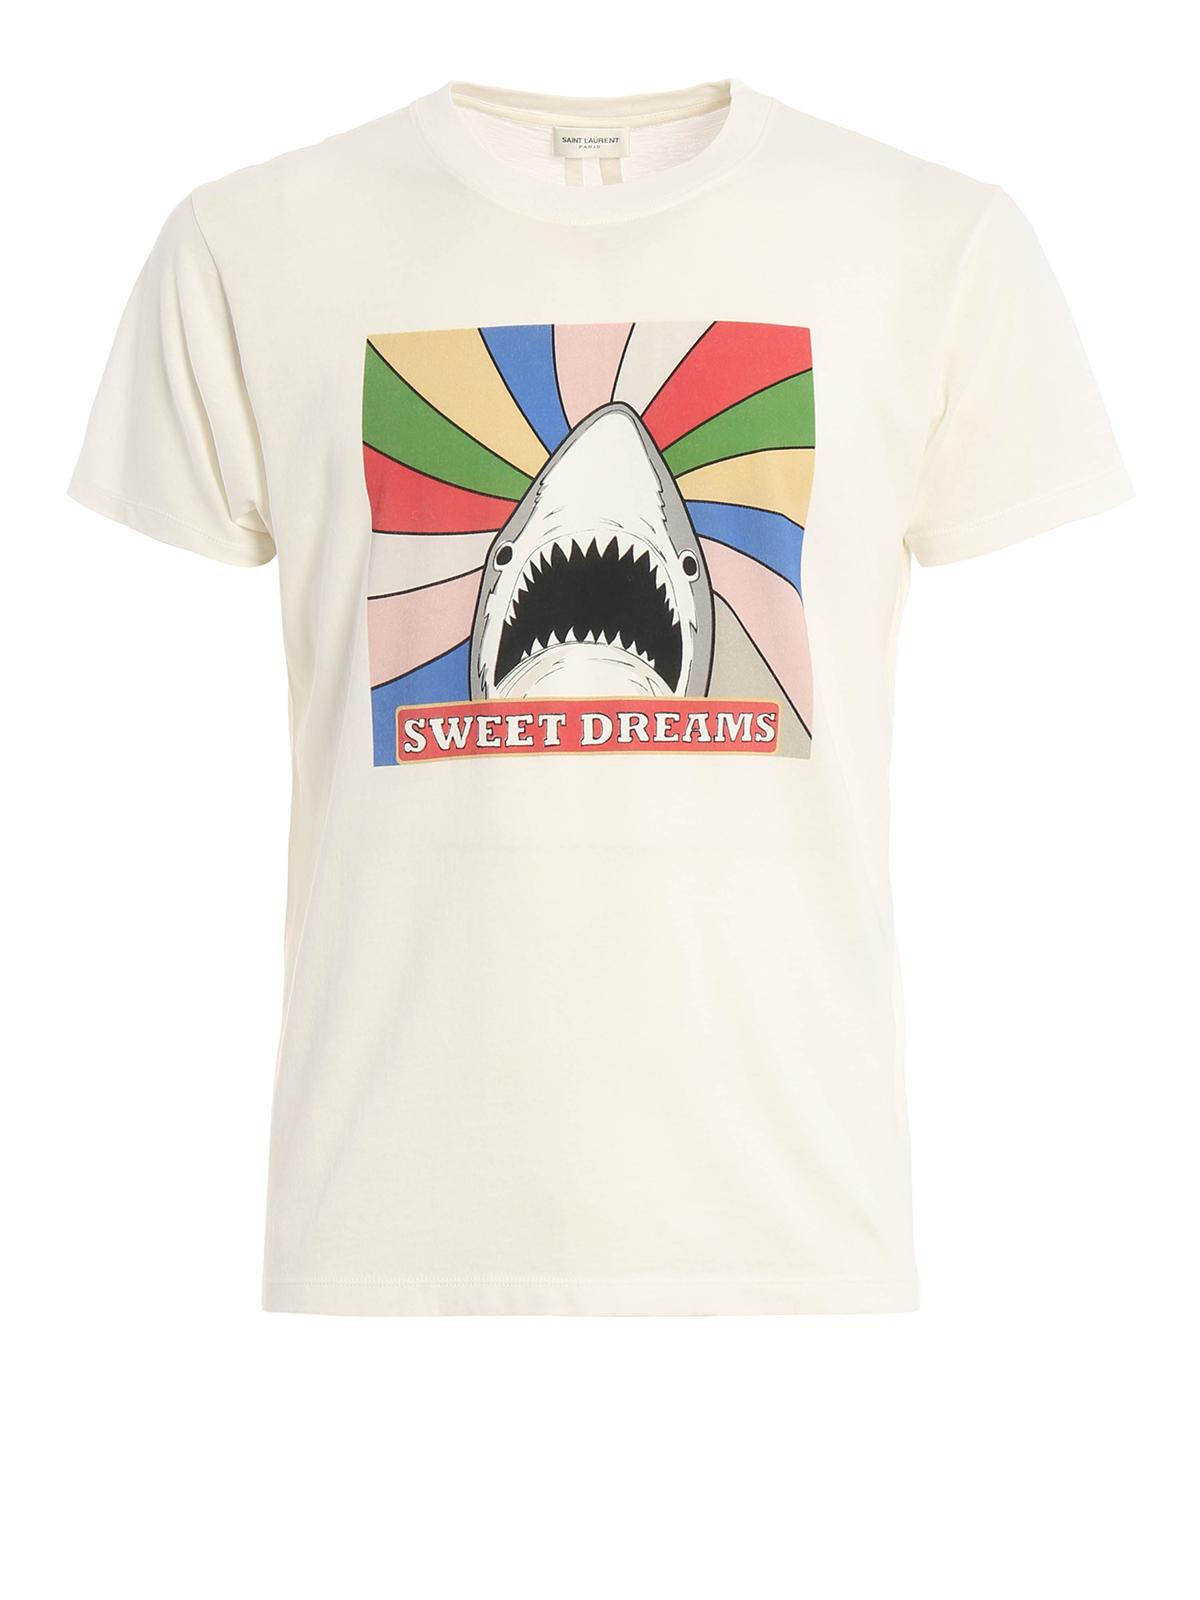 saint laurent shark print t shirt t shirts 454147. Black Bedroom Furniture Sets. Home Design Ideas